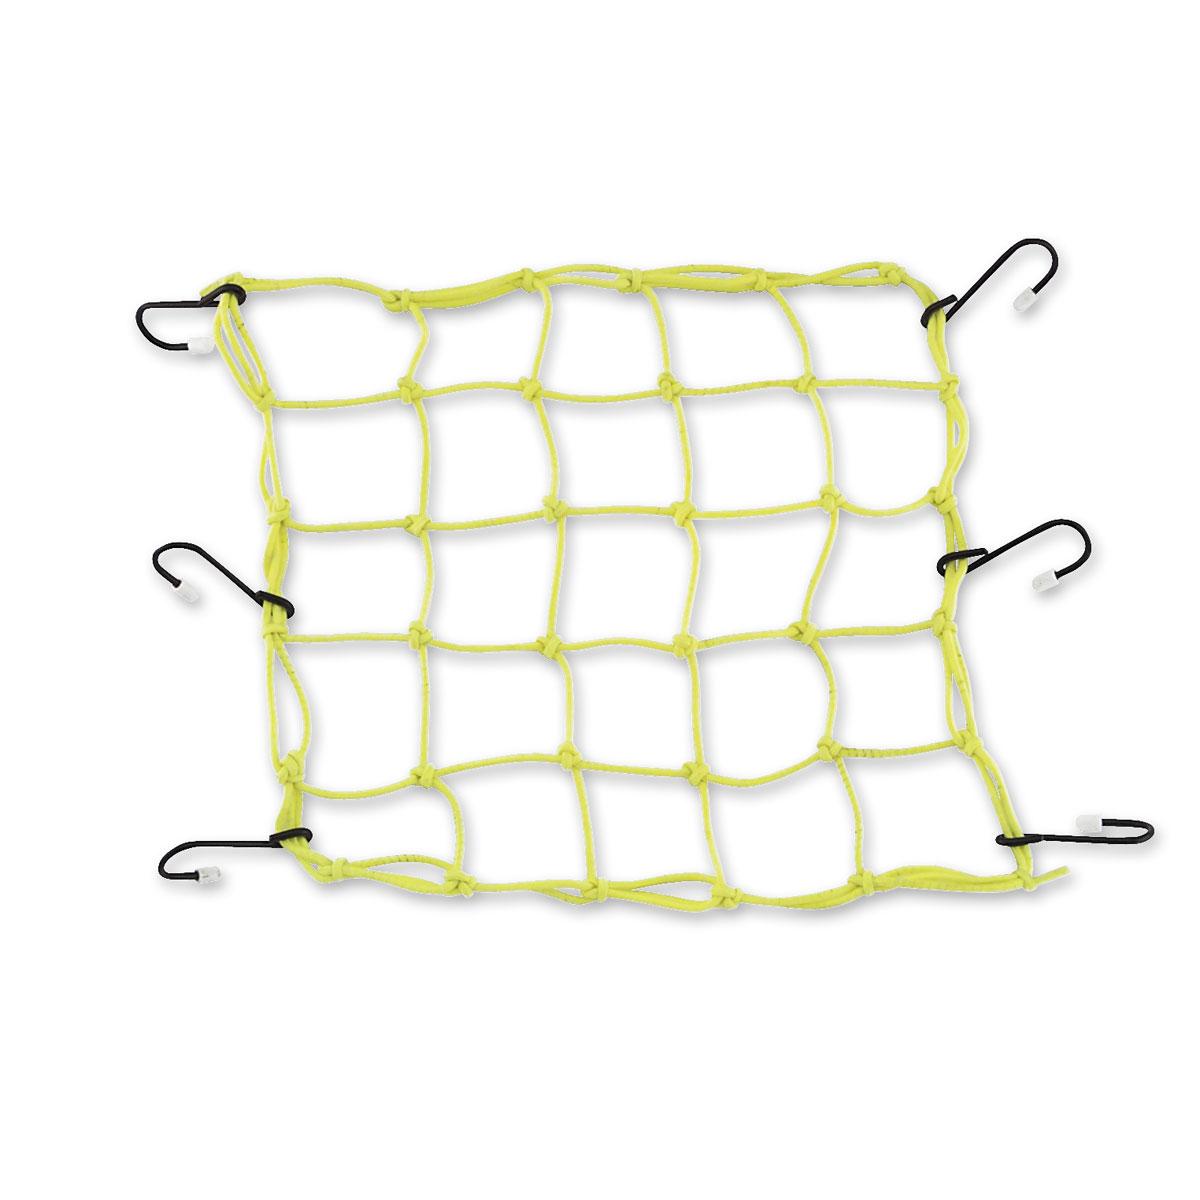 BikeMaster Yellow Stretch Net